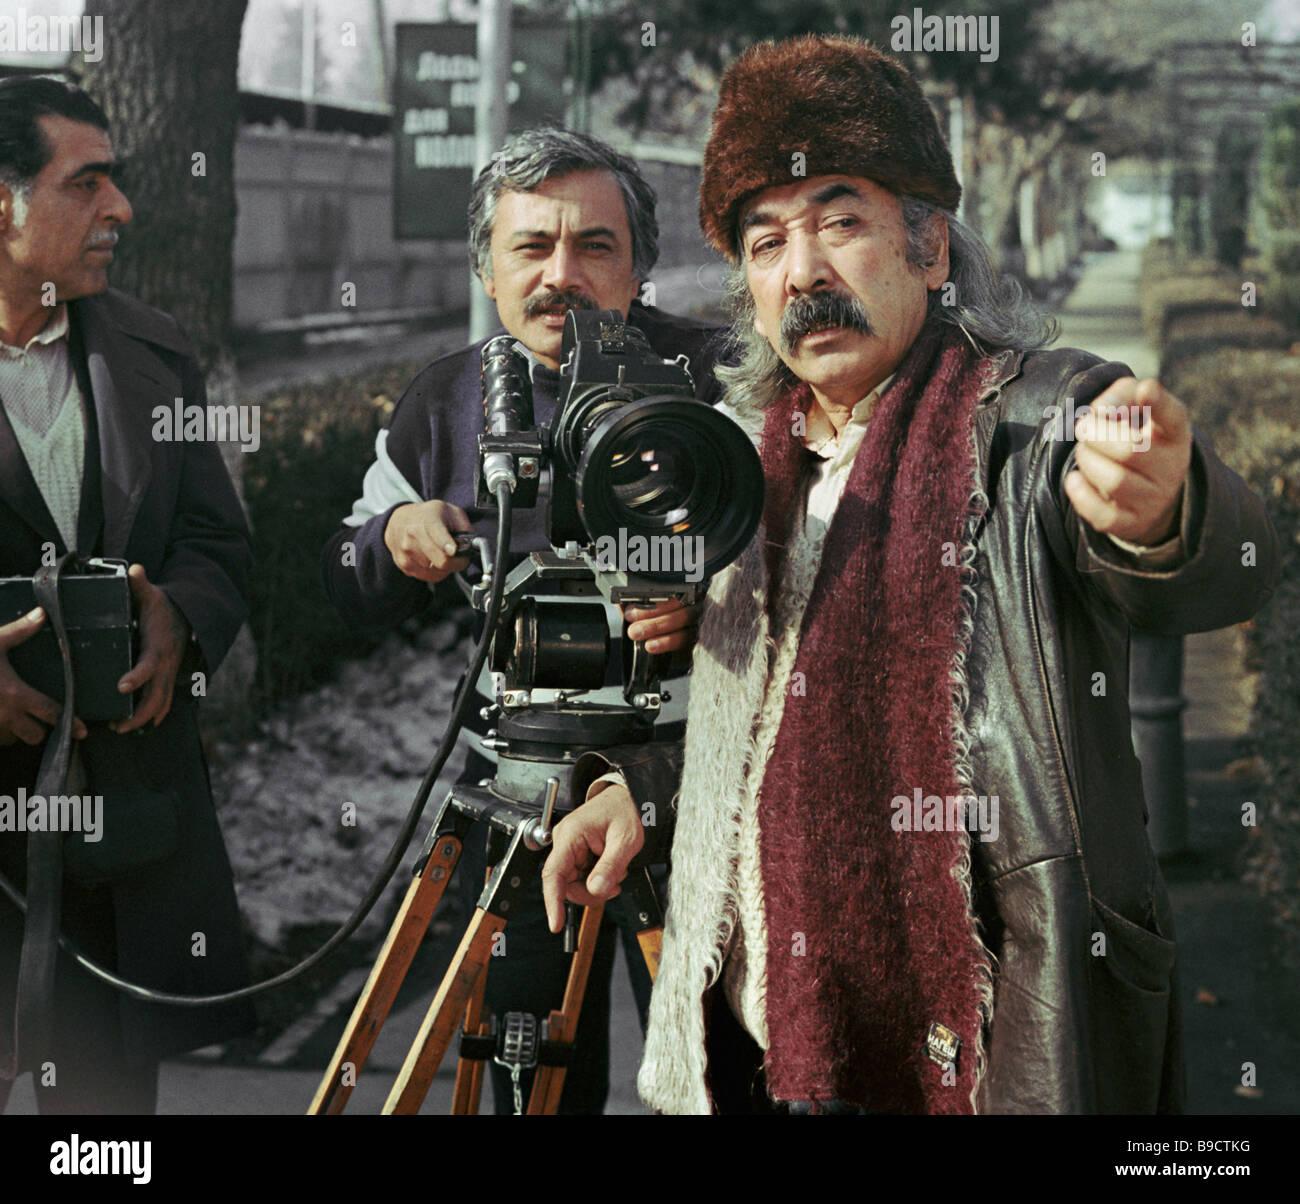 The director of the film New Tales of Sheherezade Takhir Sabirov right and cameraman Rustam Mukhamedzhanov - Stock Image